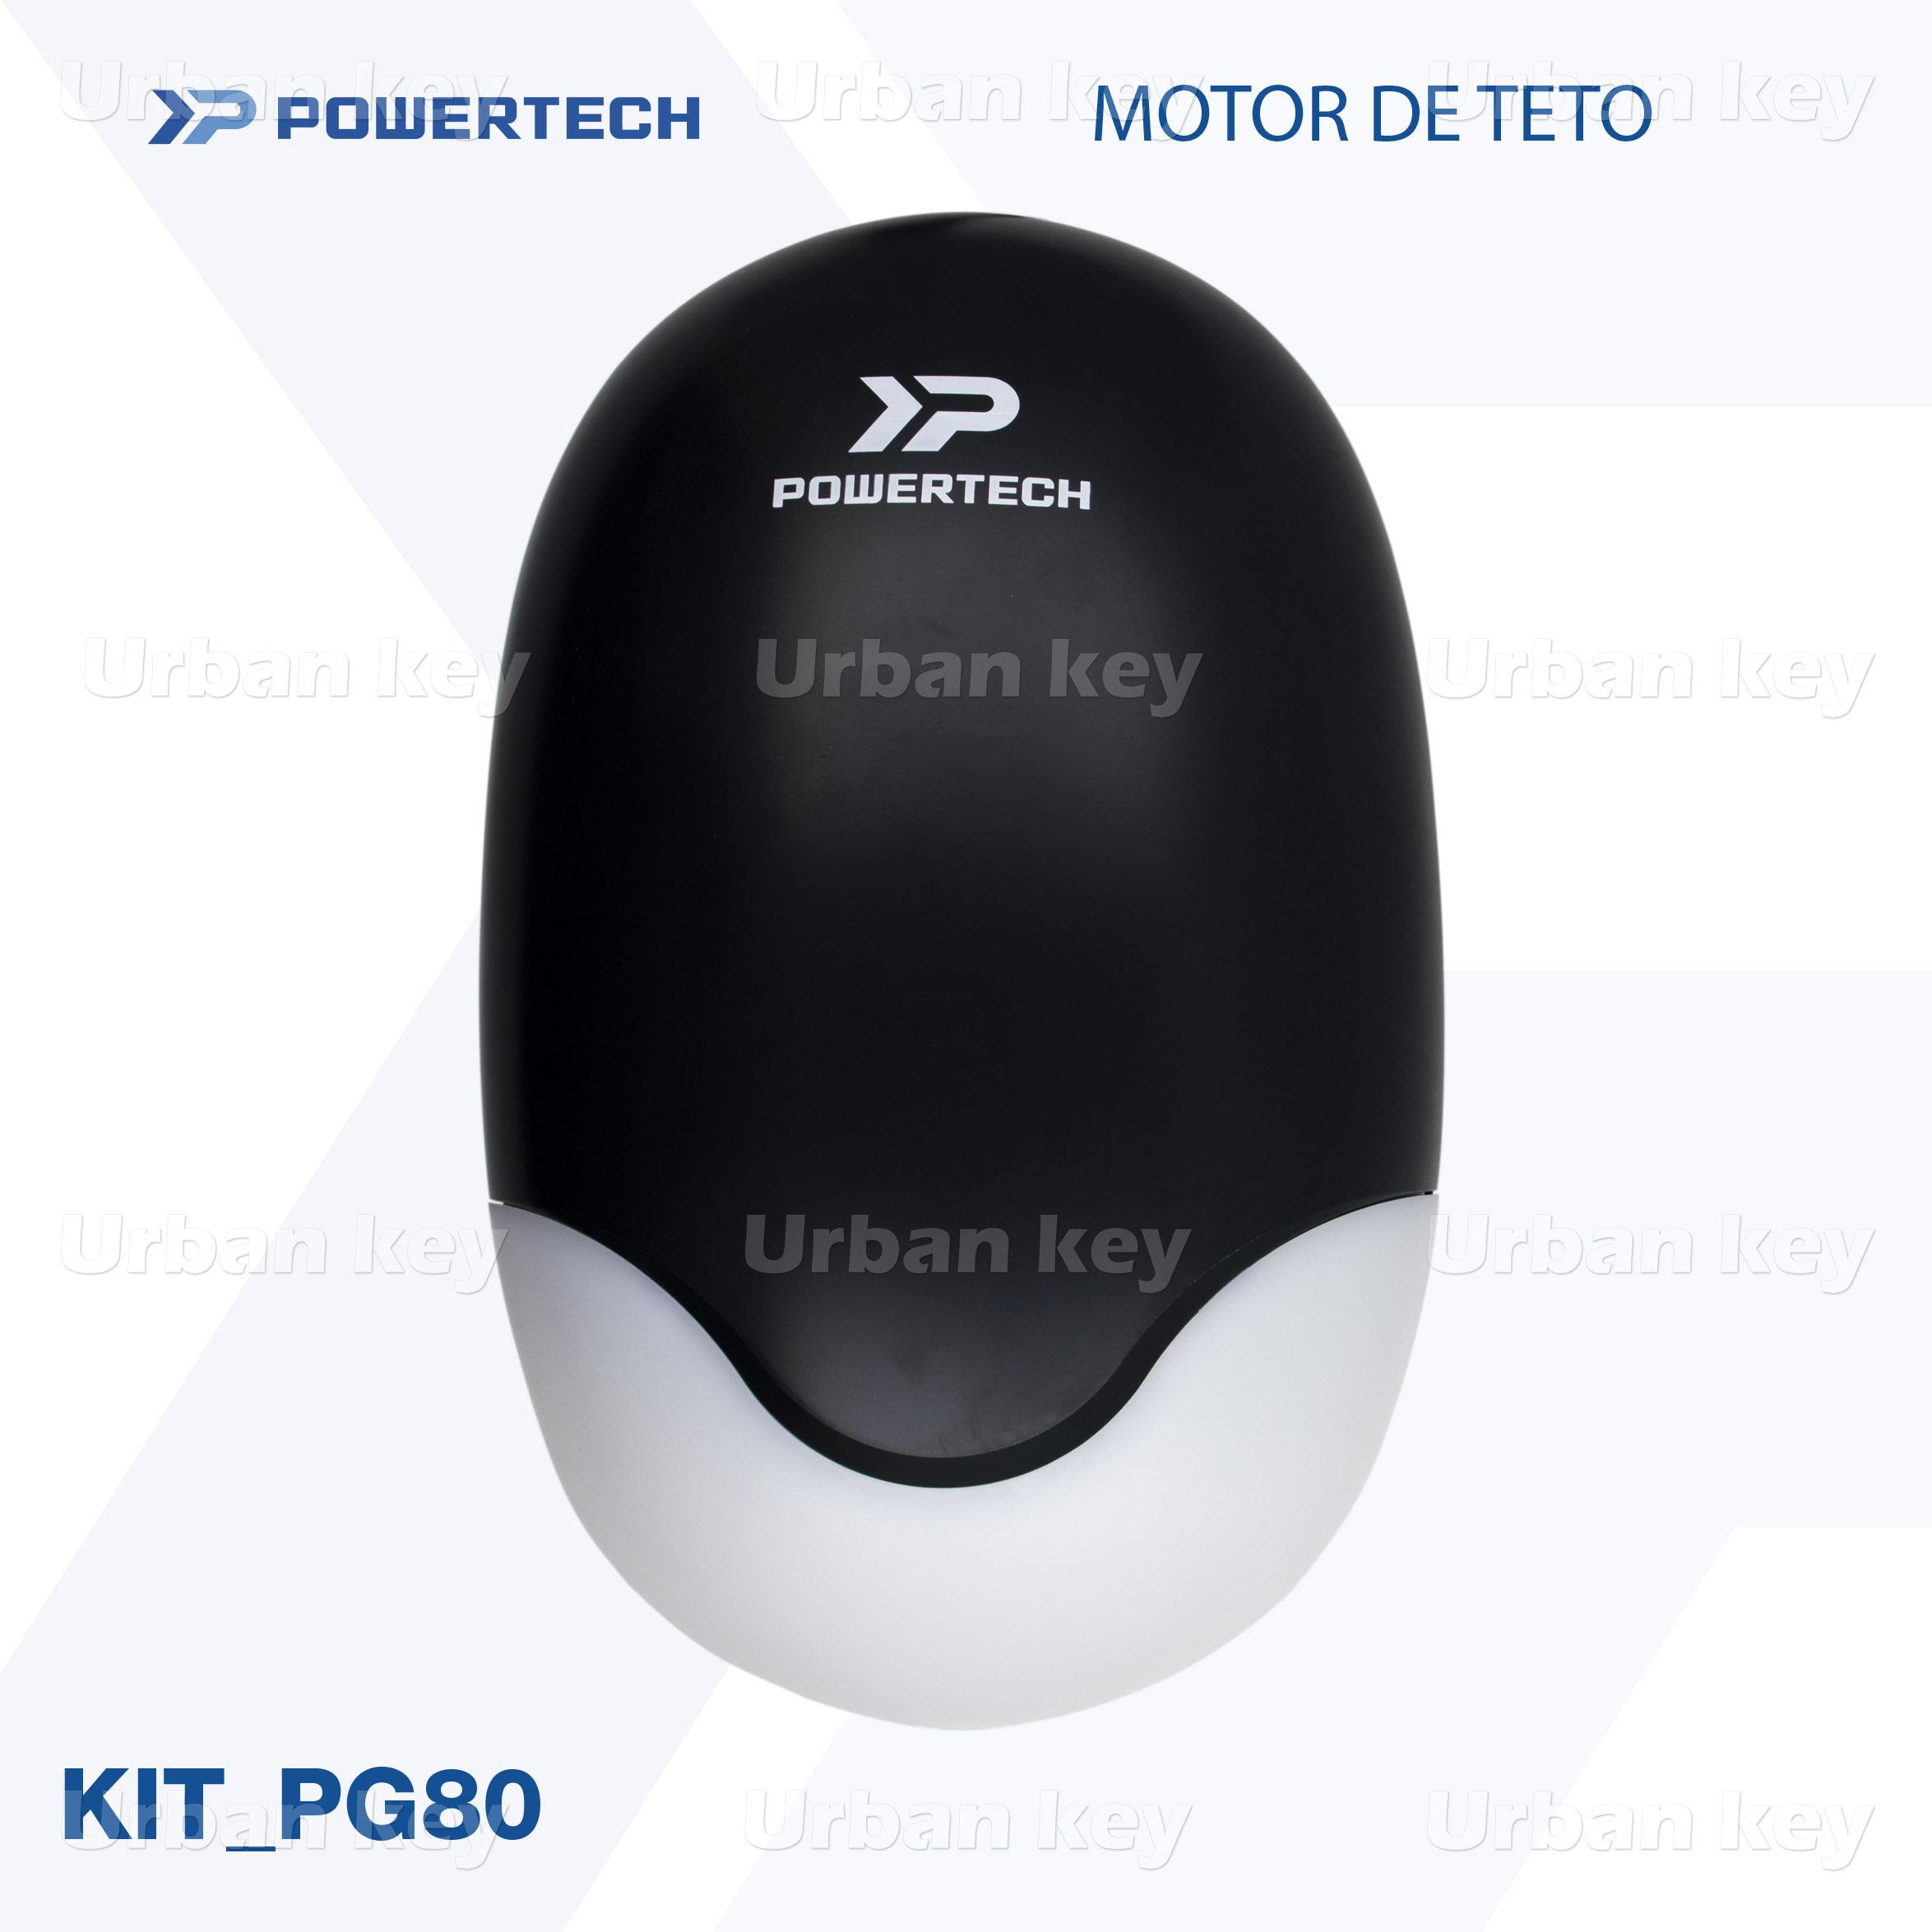 KIT MOTOR DE TETO PG80 POWERTECH